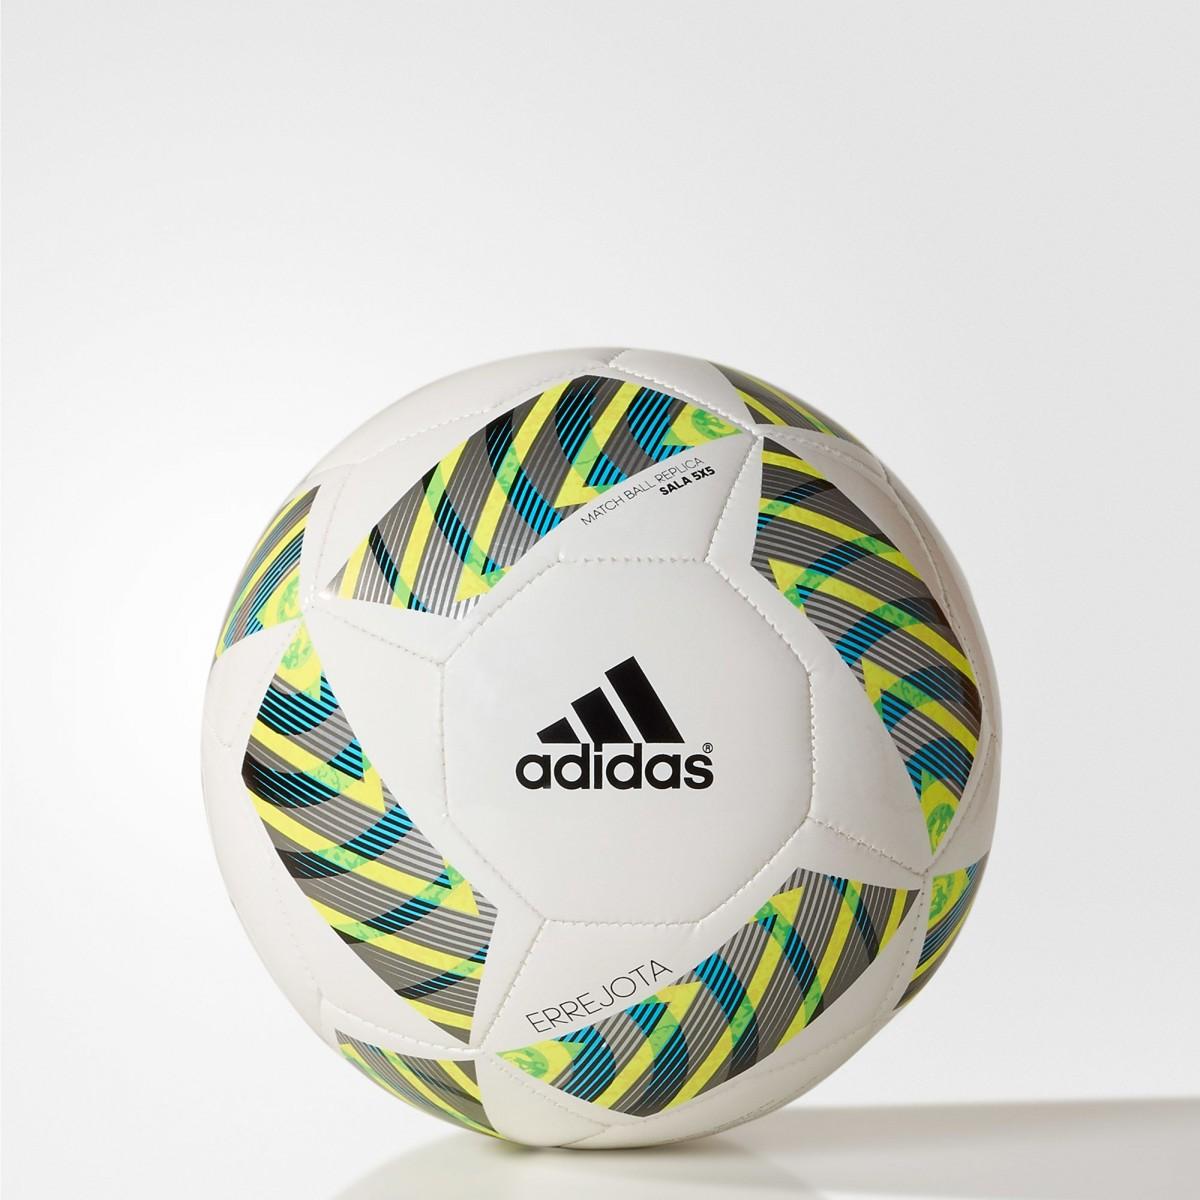 Bizz Store - Bola de Futsal Adidas Fifa Sala 5x5 Errejota Branca b69f2fa779206